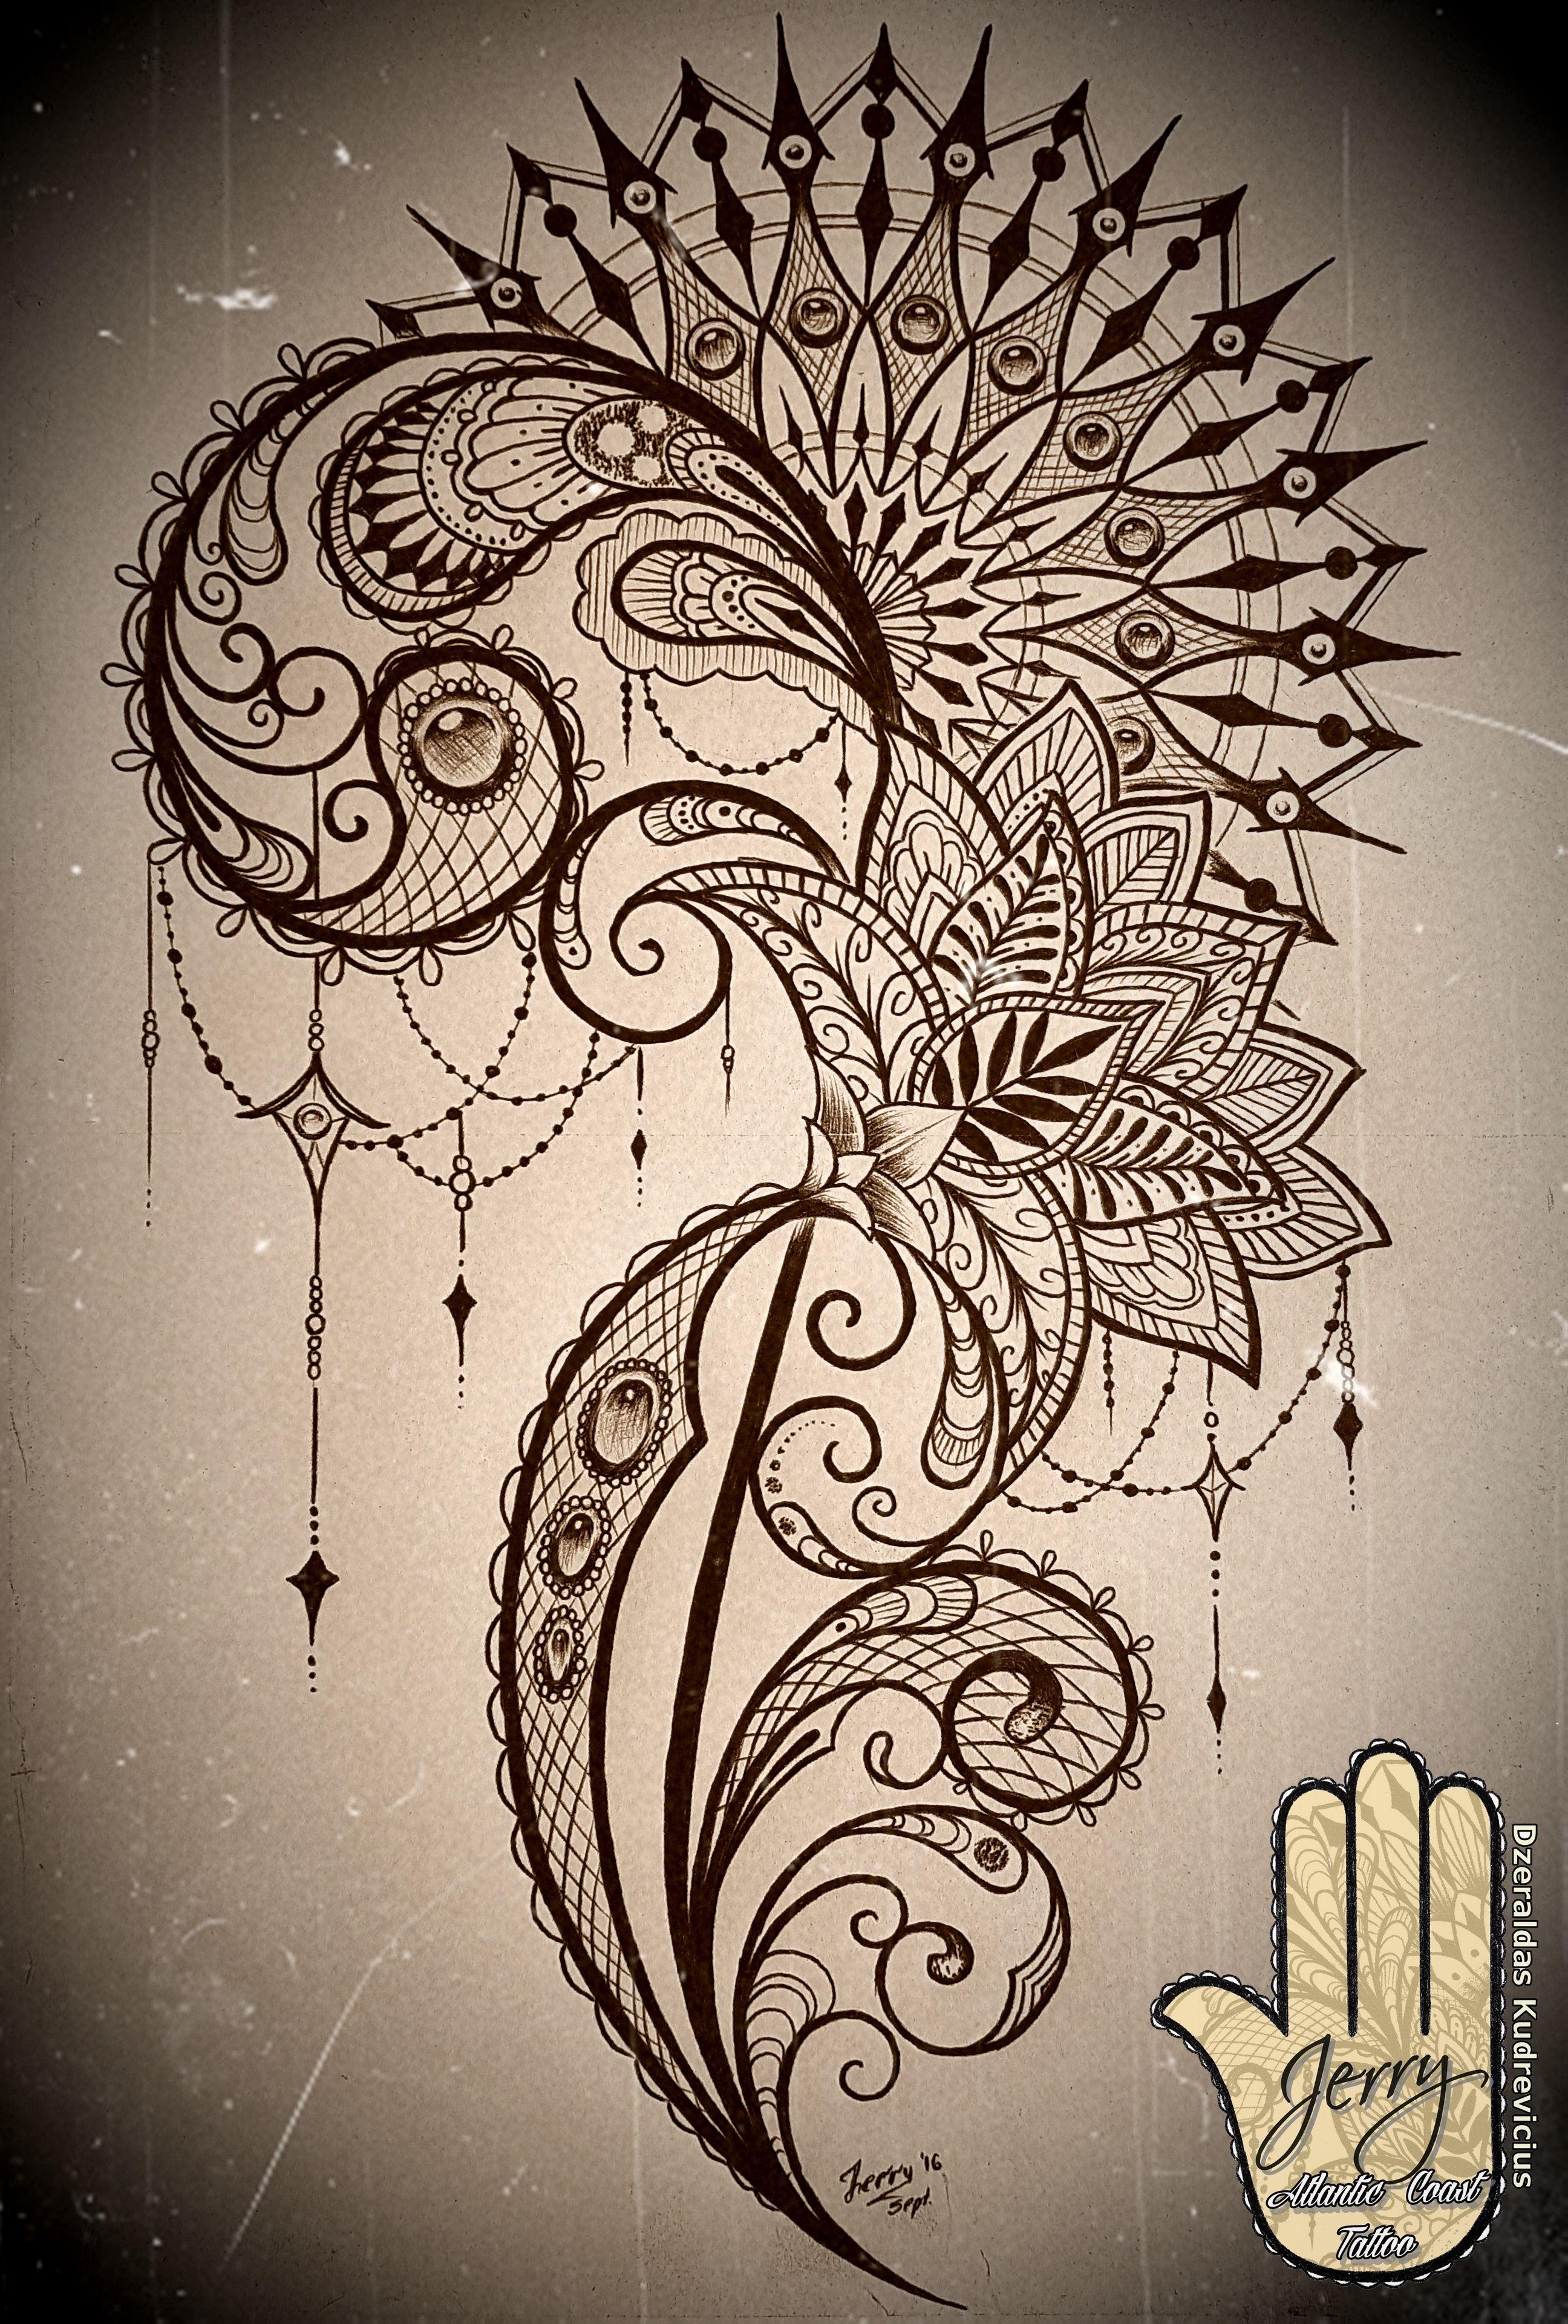 Heart Shaped Dreamcatcher Drawing